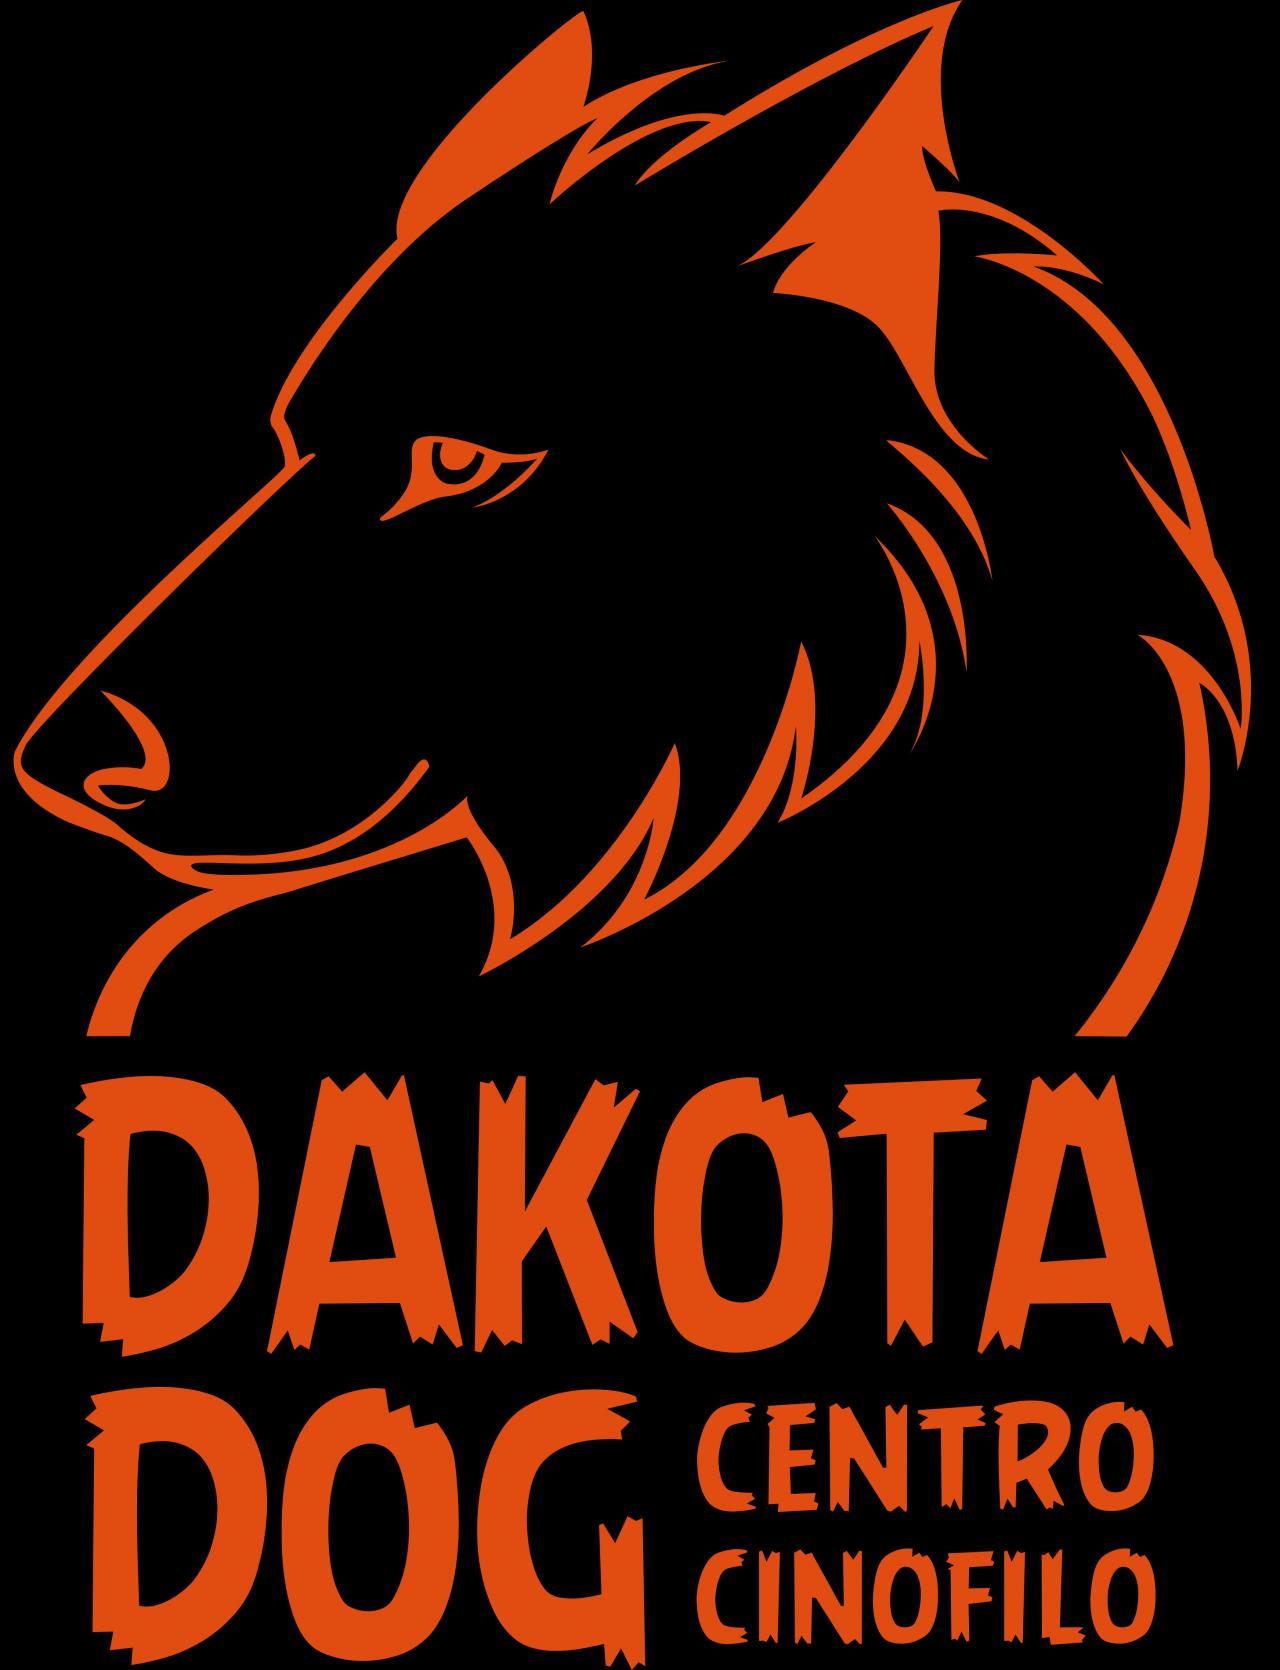 Dakota Dog